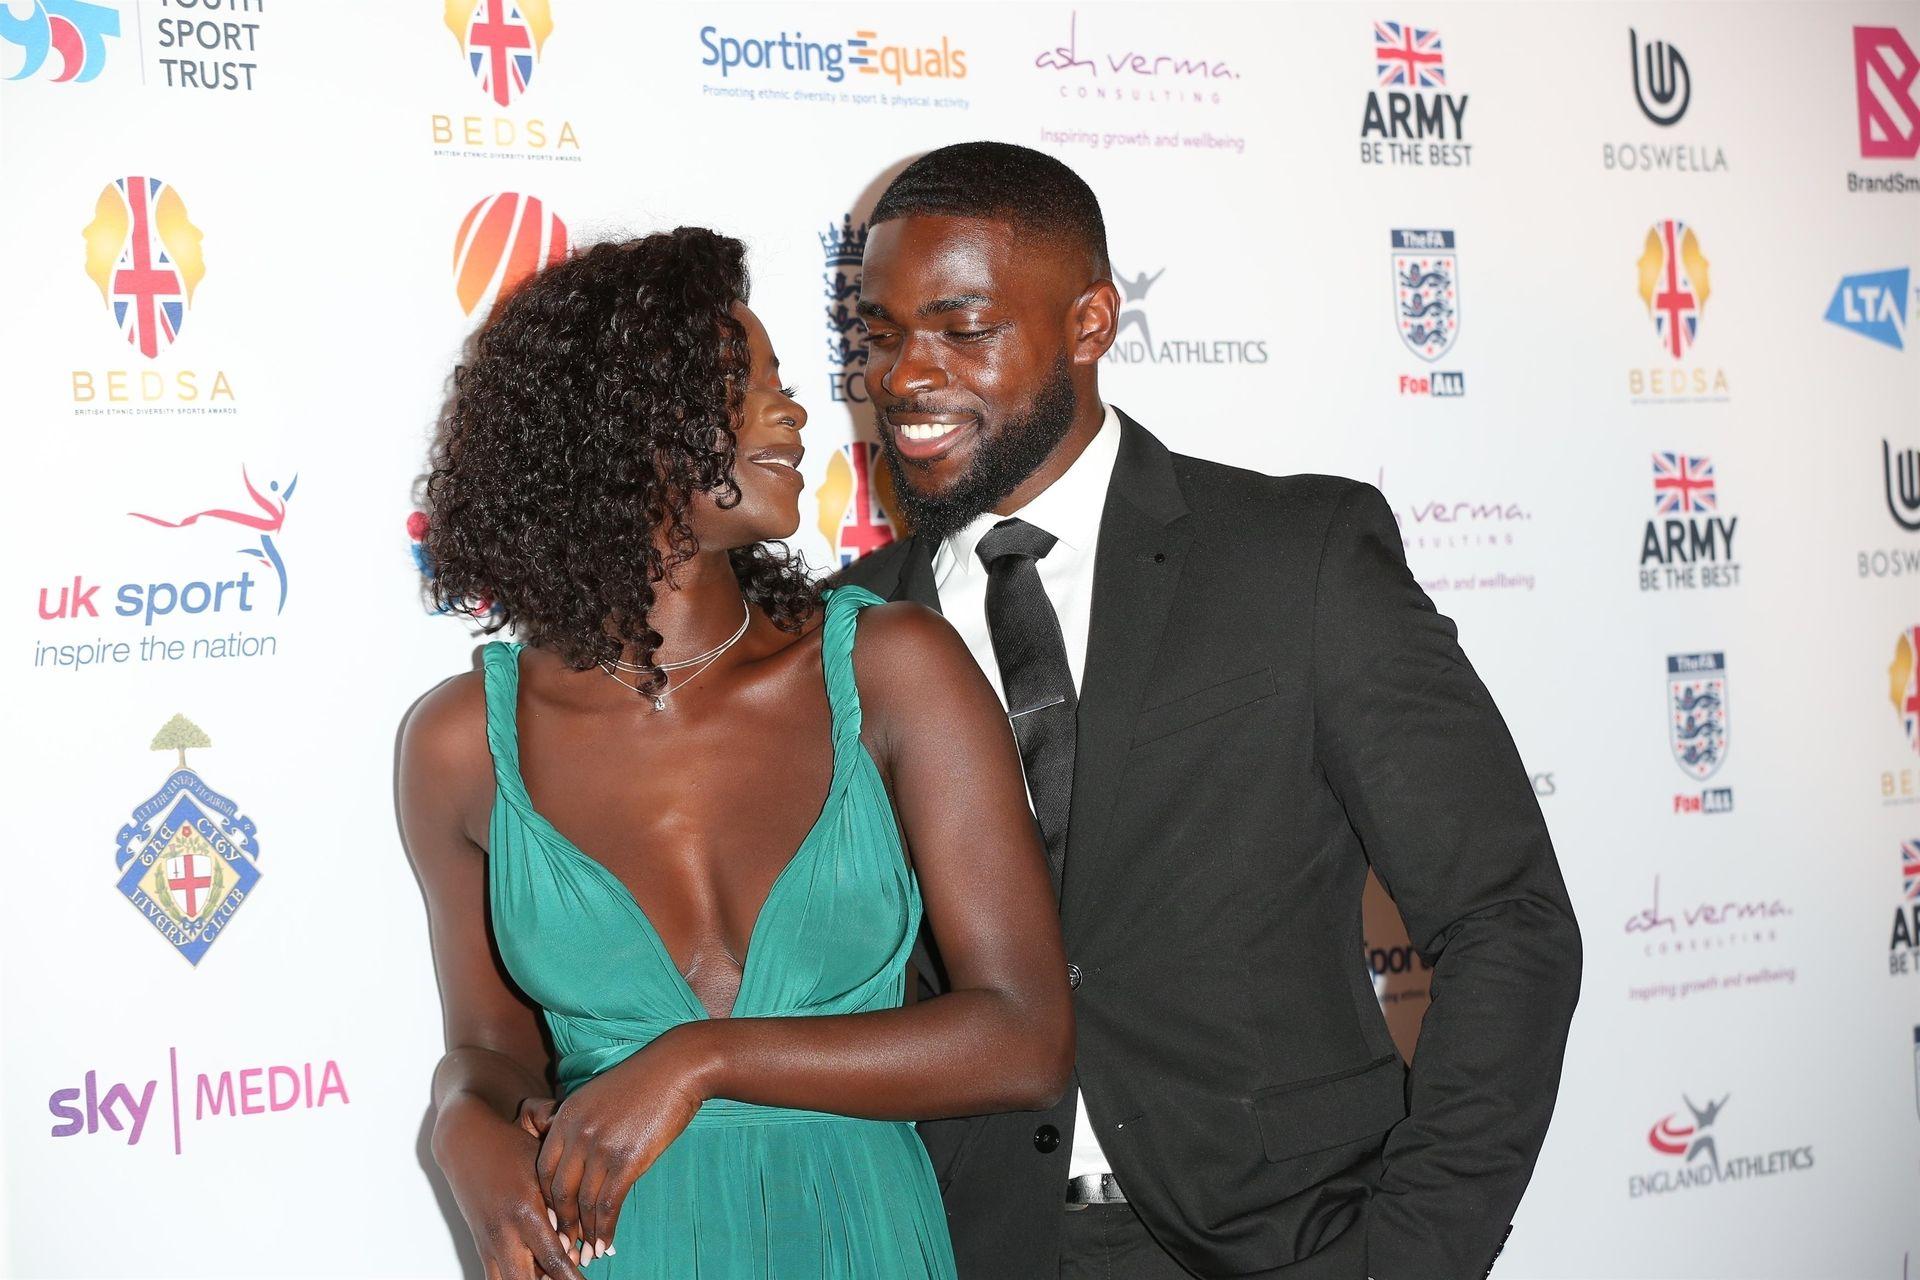 Mike Boateng & Priscilla Anyabu Are Seen At British Ethnic Diversity Sports Awards 0057